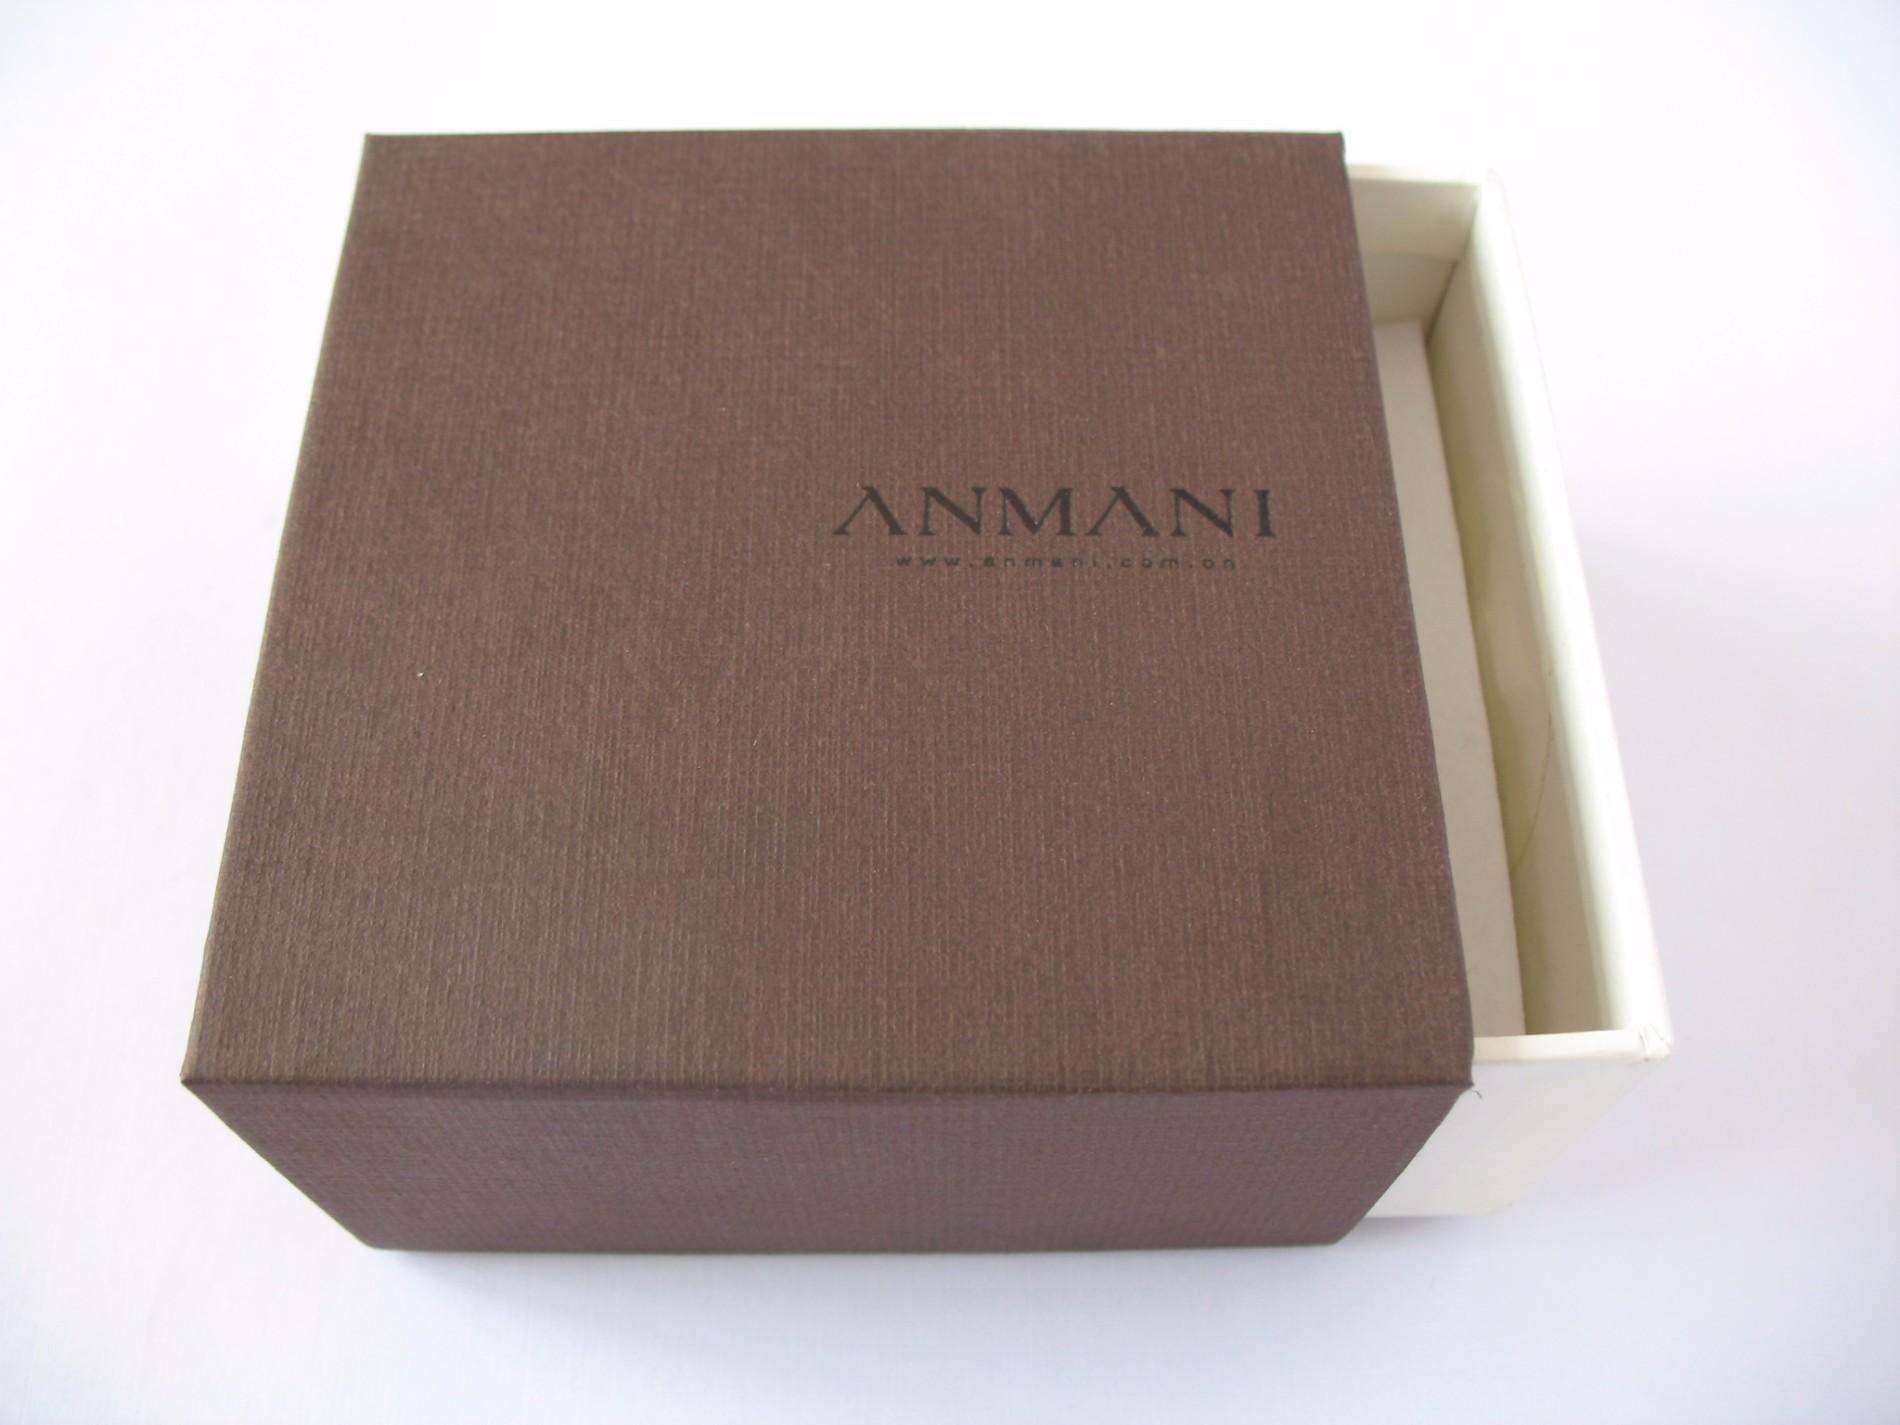 Cardboard packaging gift box Manufacturers, Cardboard packaging gift box Factory, Supply Cardboard packaging gift box